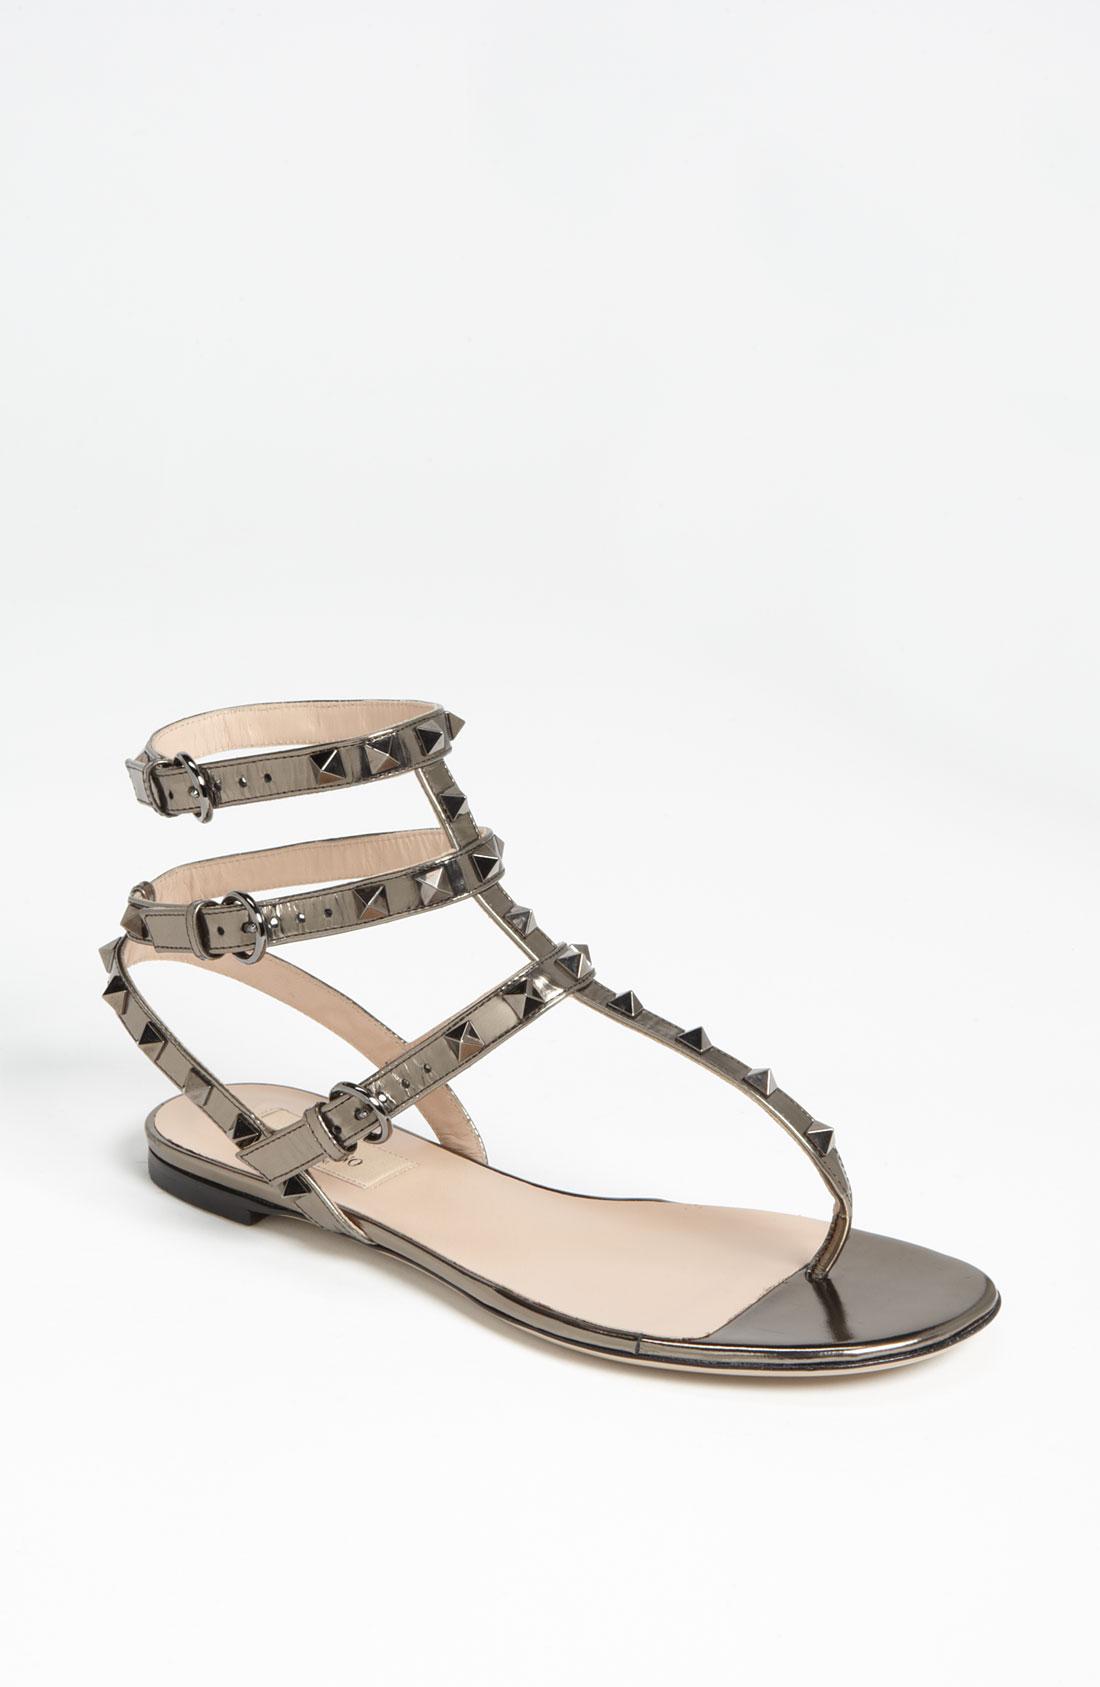 valentino rockstud flat sandal in silver bronze lyst. Black Bedroom Furniture Sets. Home Design Ideas